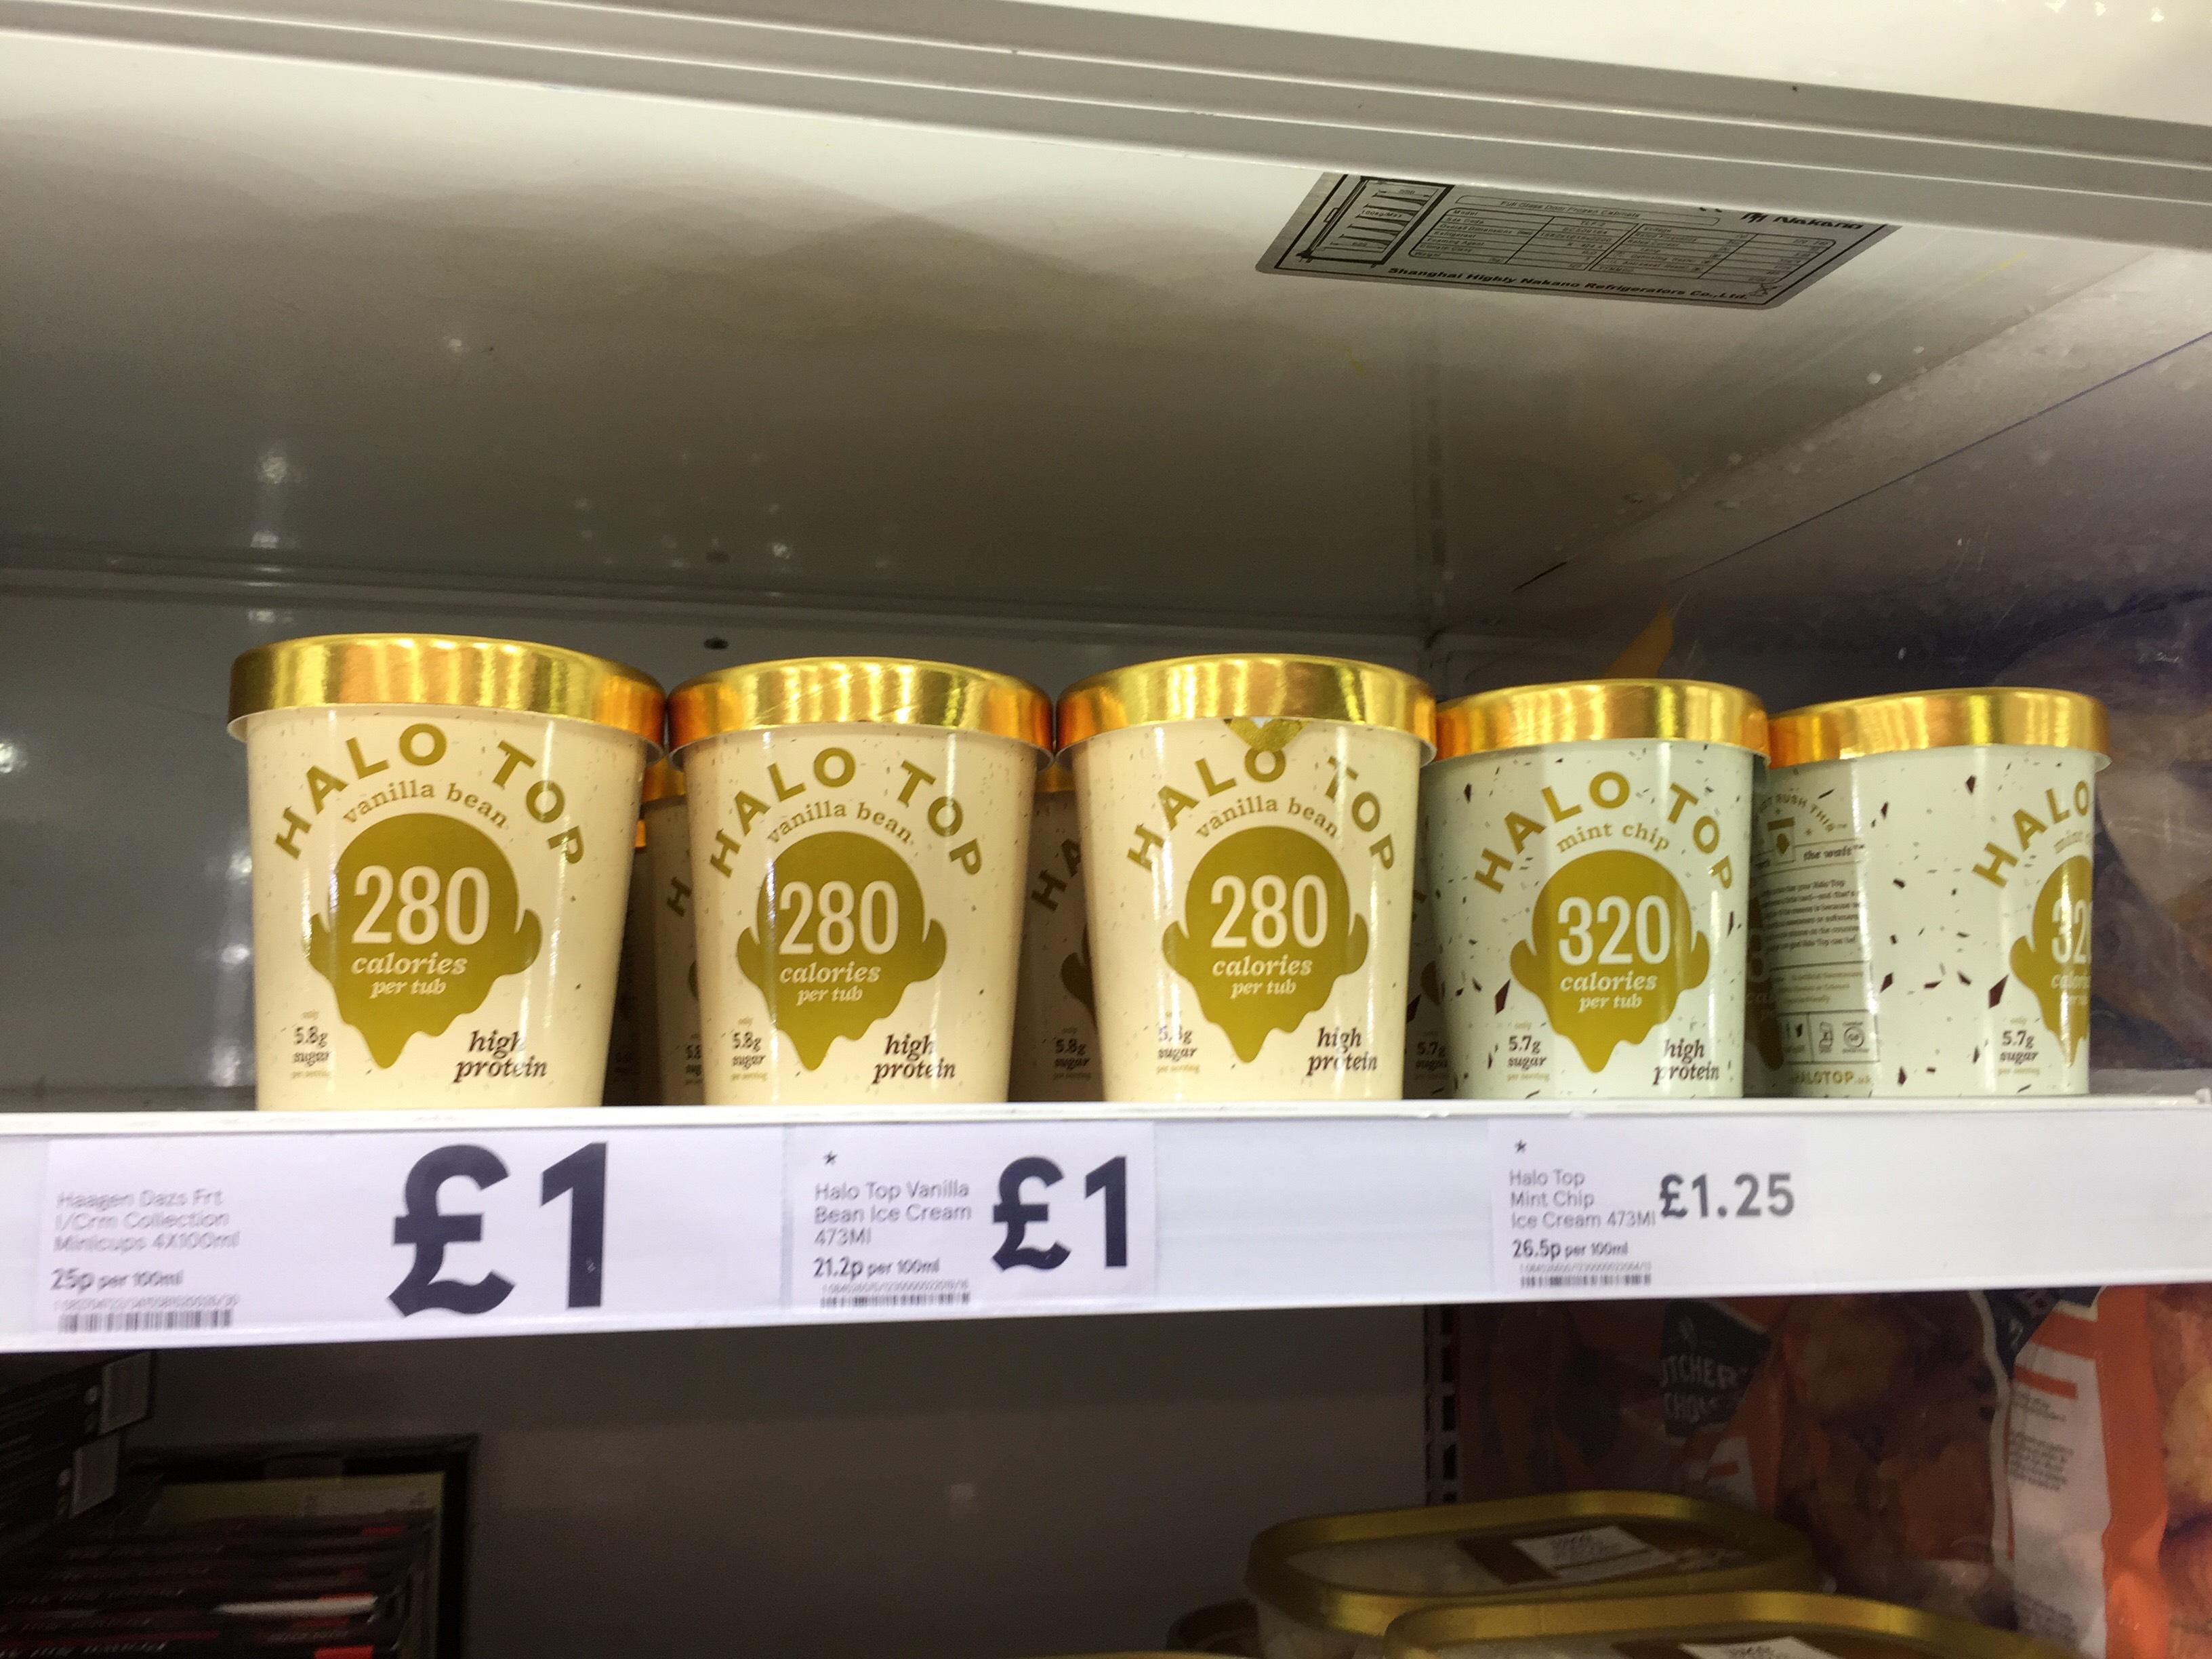 Cream Ice ice cream Tops discount offer